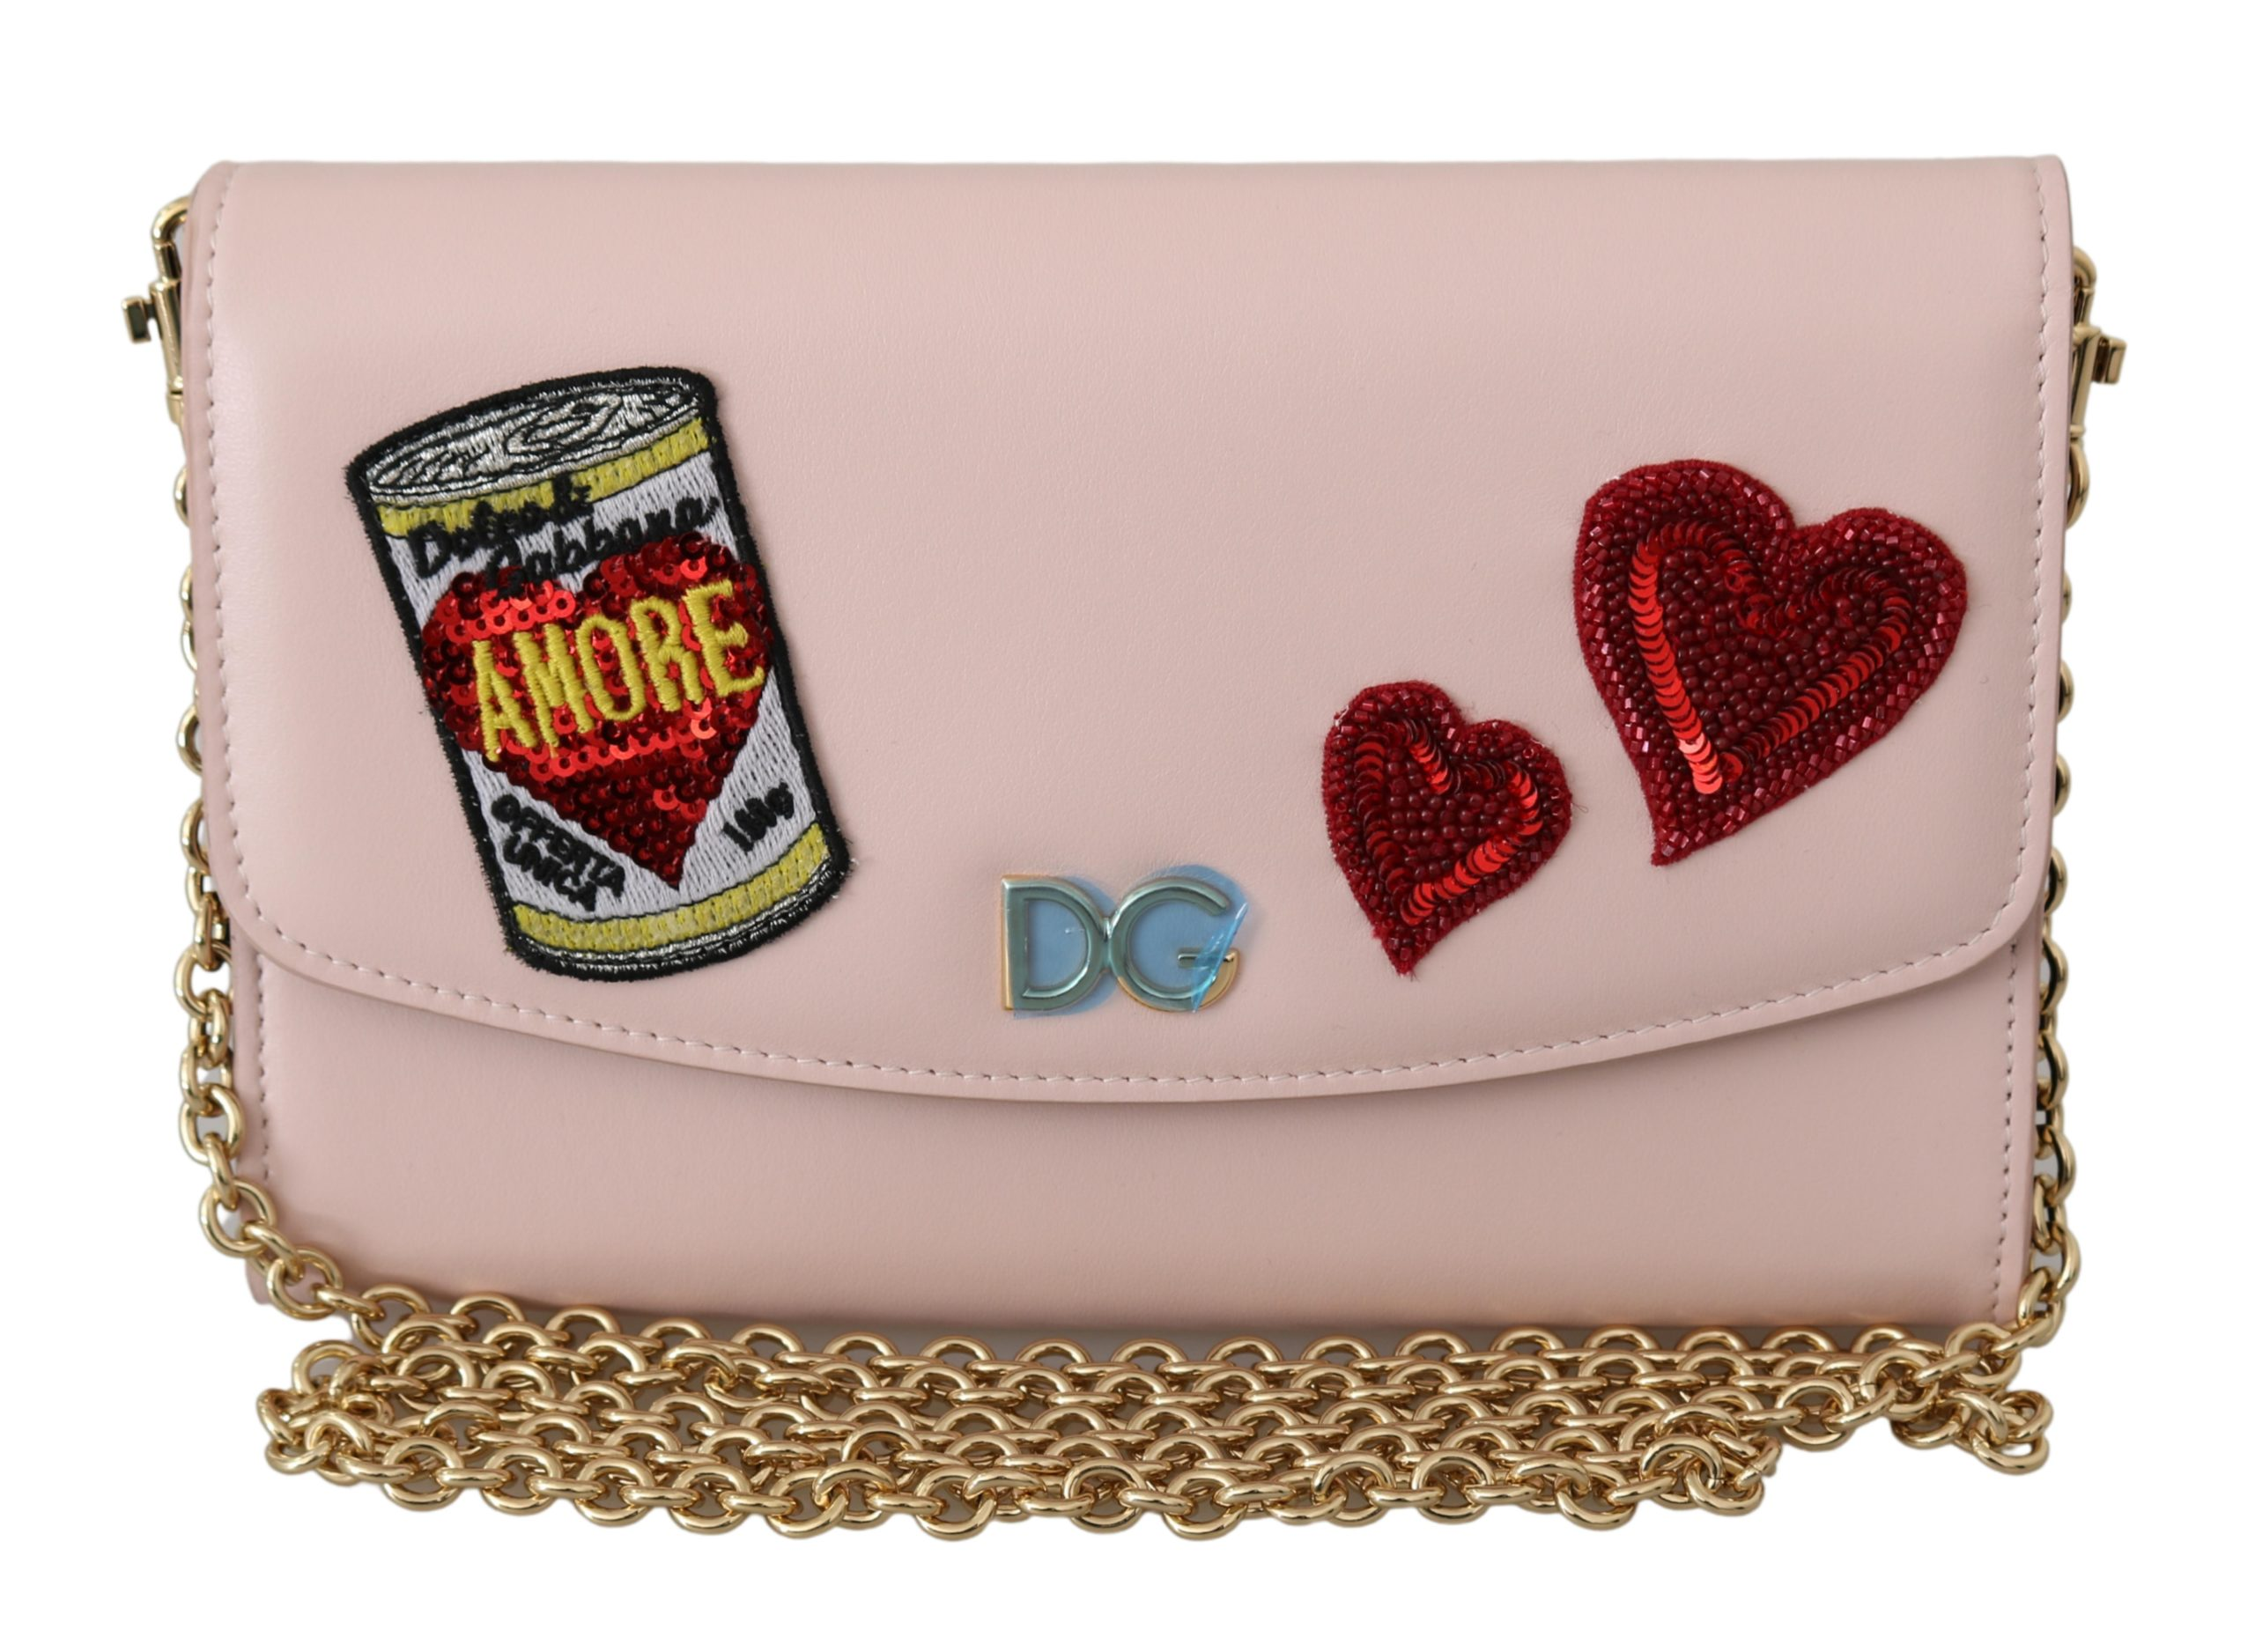 Dolce & Gabbana Women's Amore Patch Leather Shoulder Bag Multicolor VAS9569